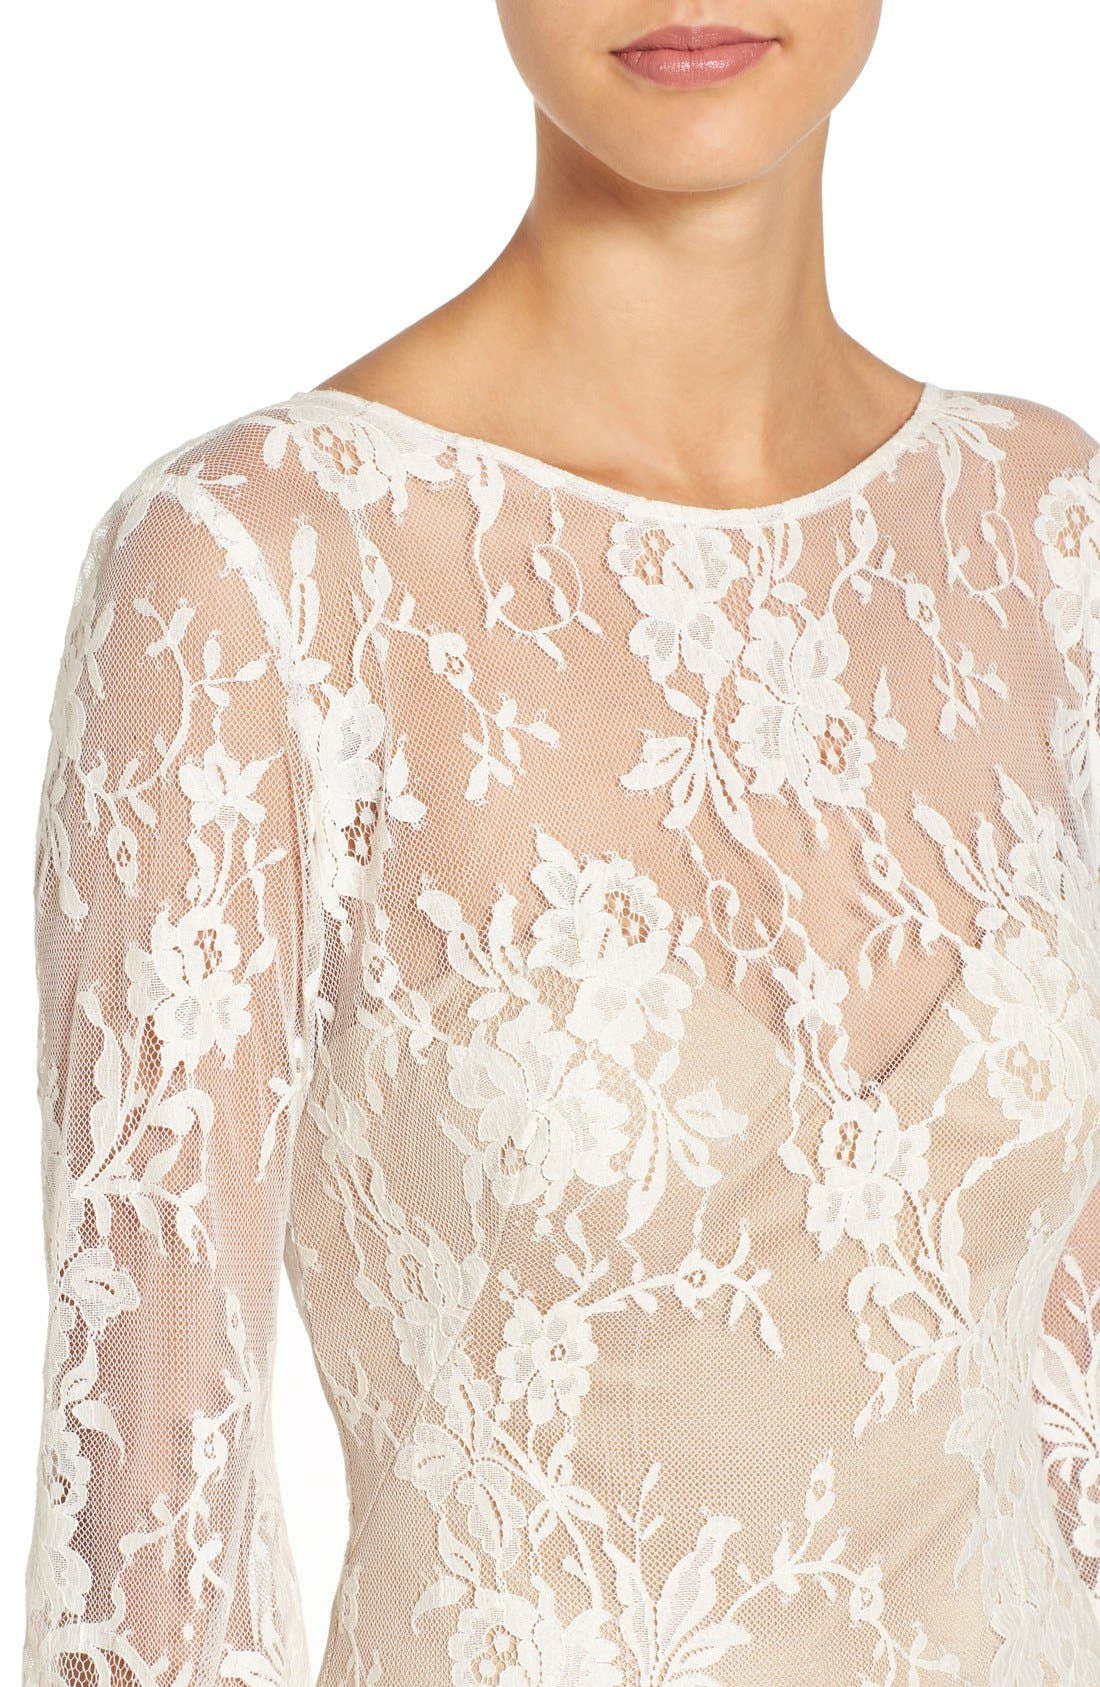 'Britney' Long Sleeve Open Back Lace Sheath Dress,                             Alternate thumbnail 4, color,                             Ivory/Nude